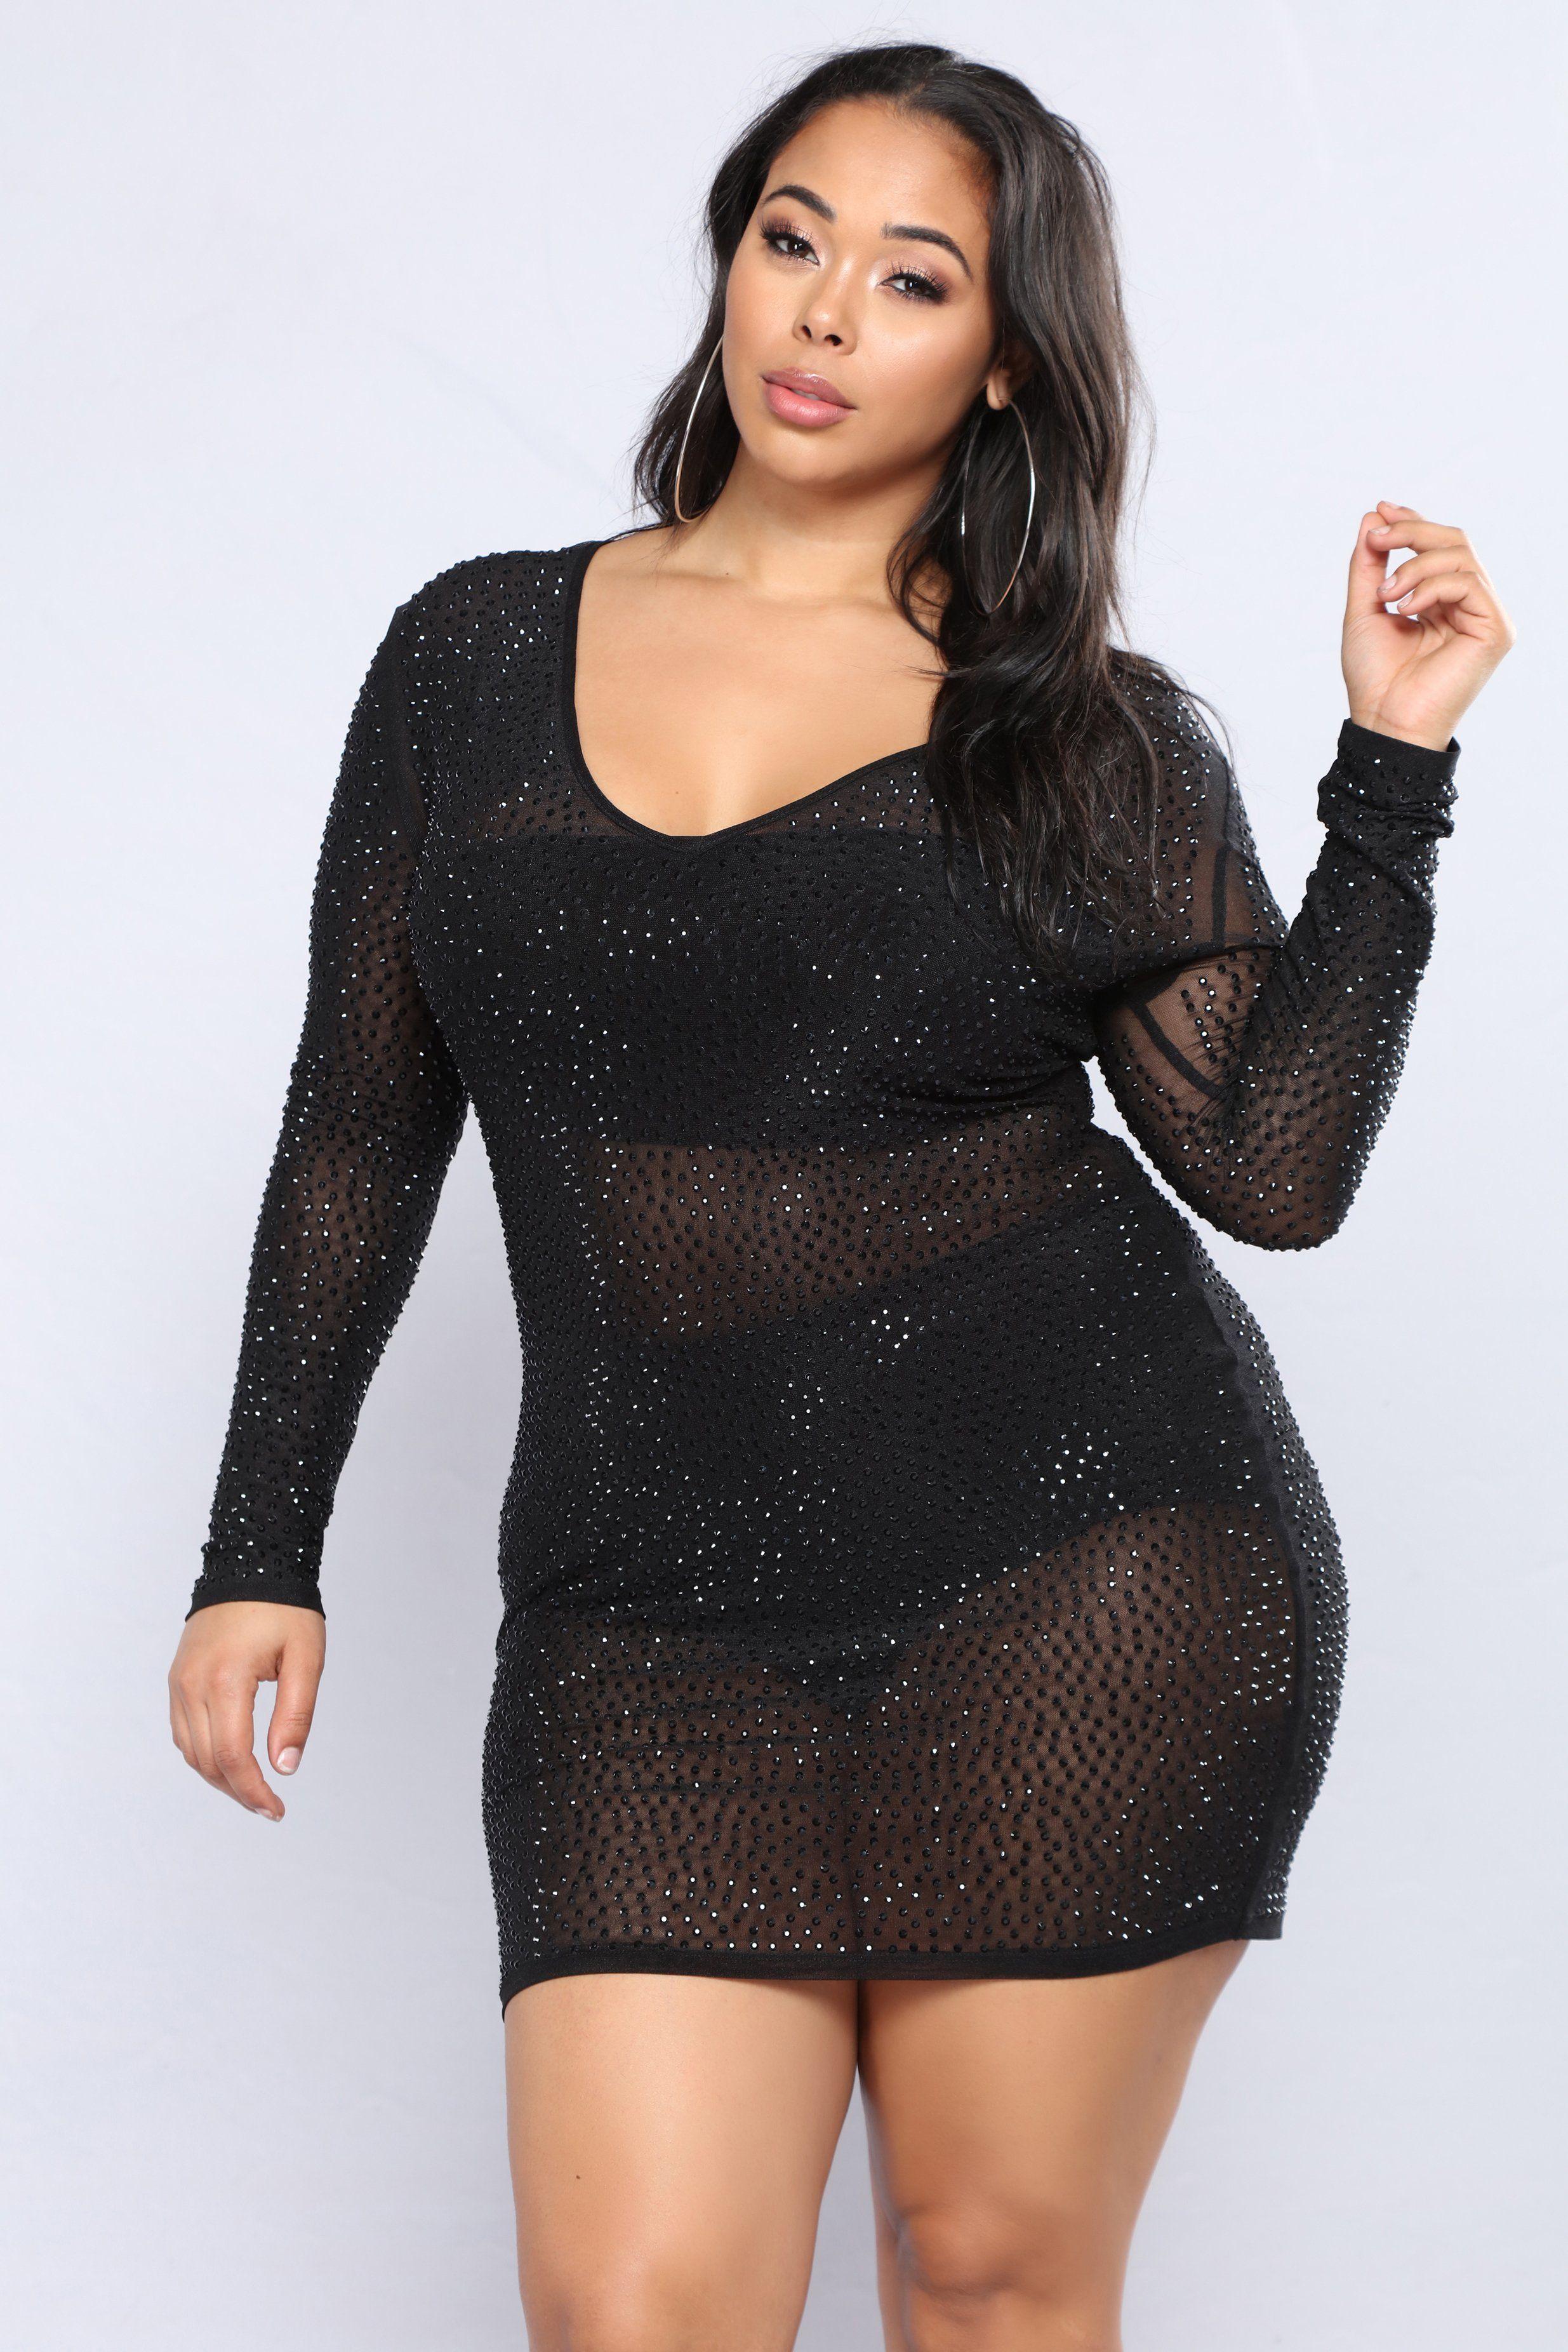 Isabela Rhinestone Dress Black Black In 2021 Plus Size Cocktail Dresses Curvy Fashion Fashion [ 3704 x 2470 Pixel ]